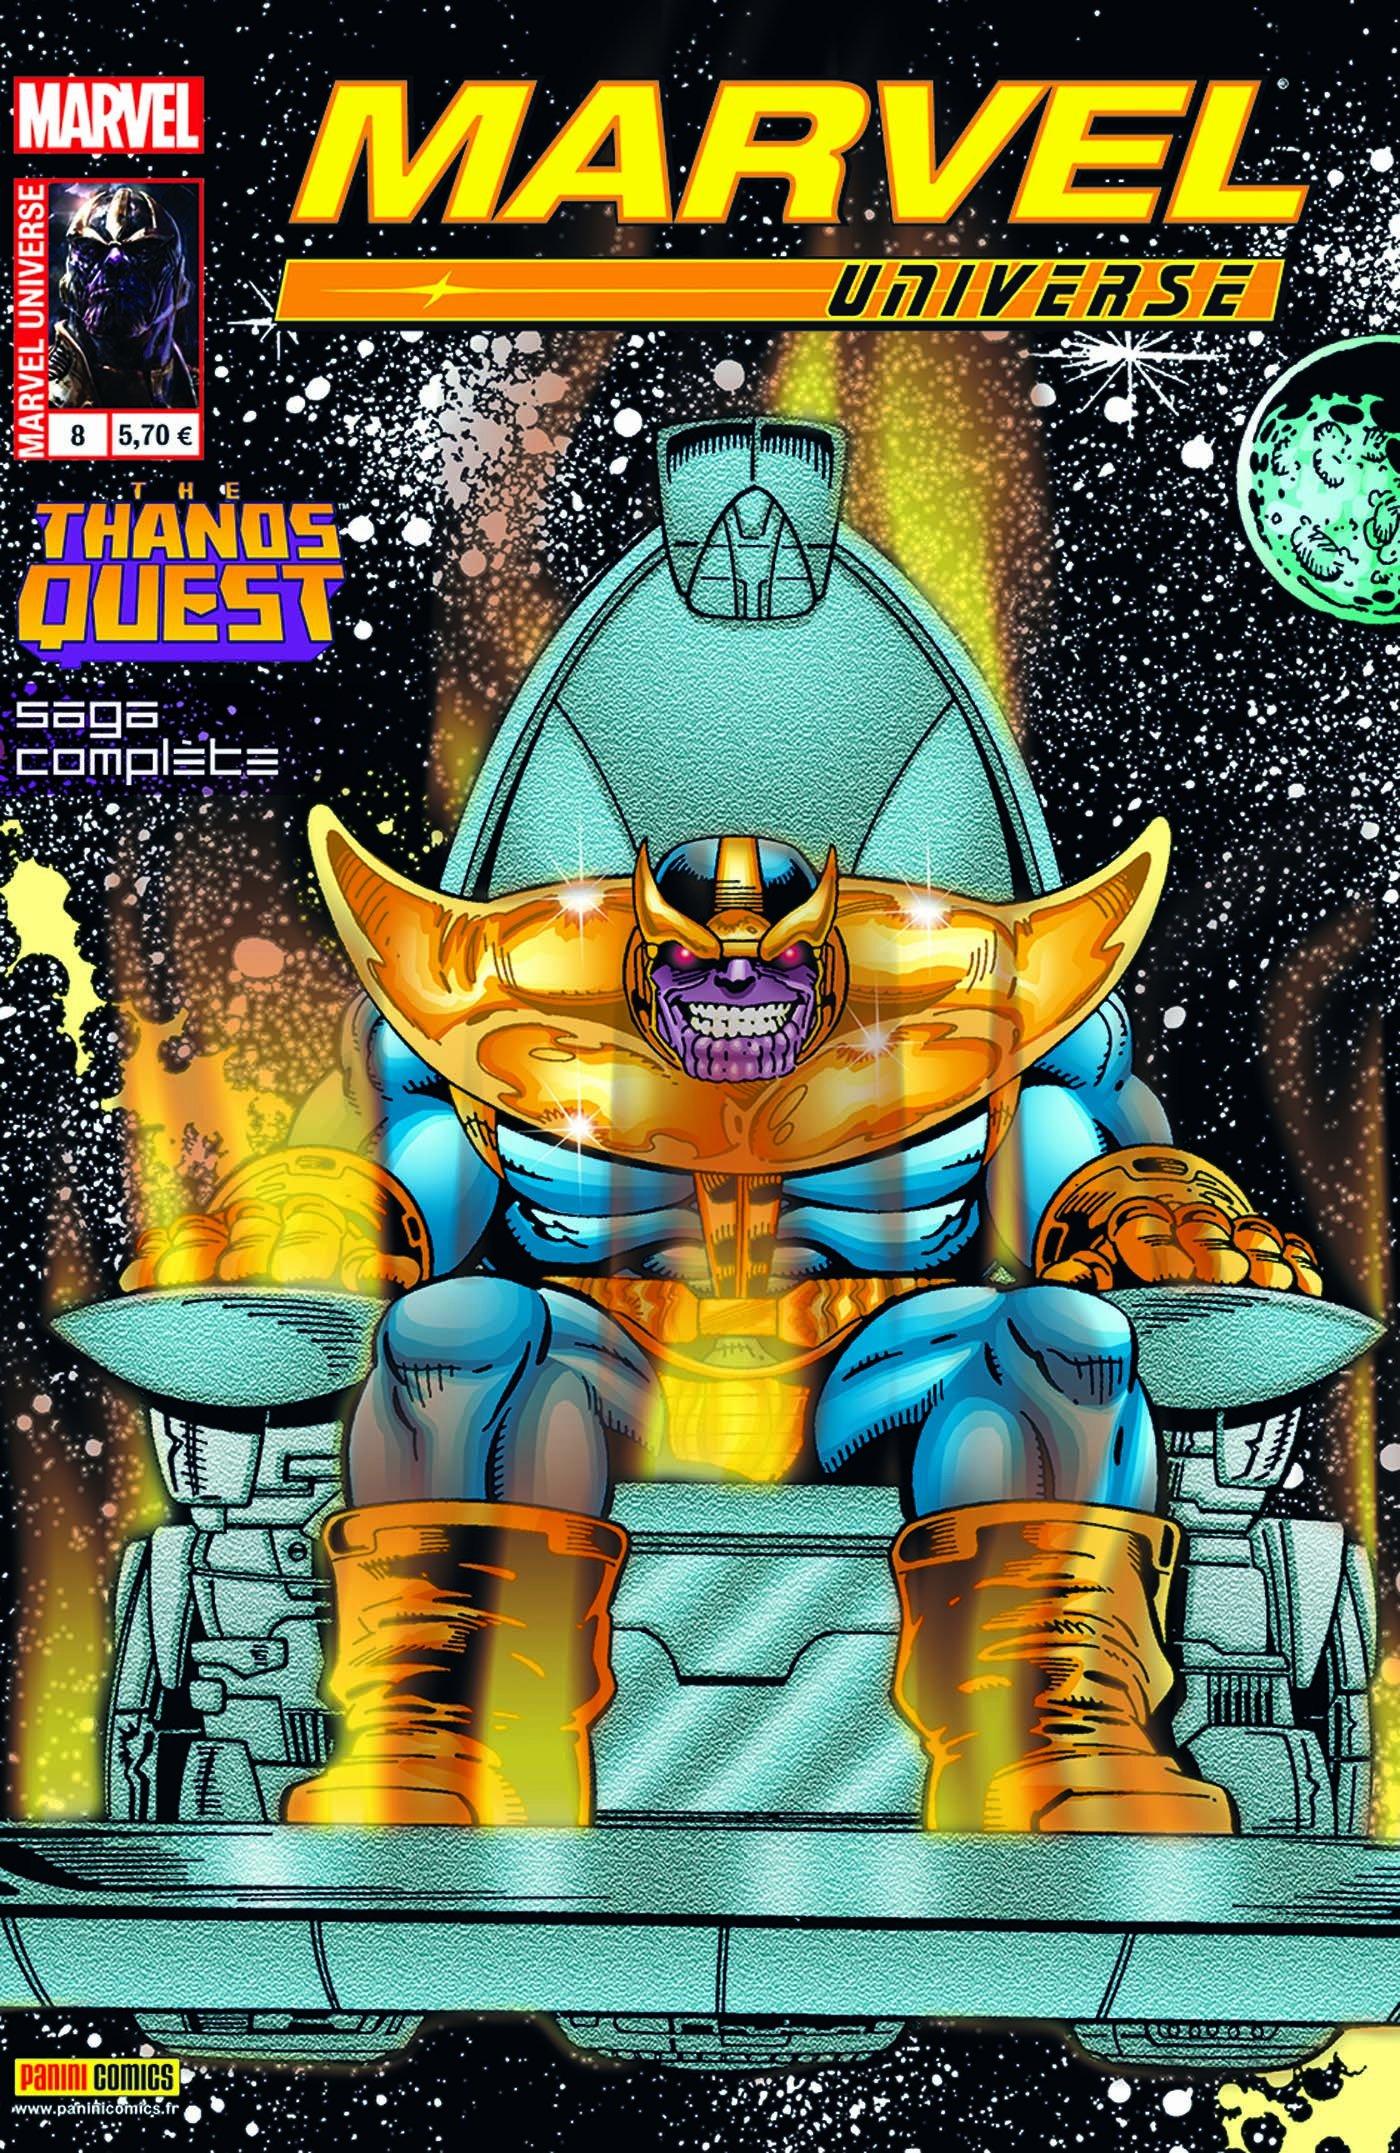 Marvel universe v2 08 (VF) occasion